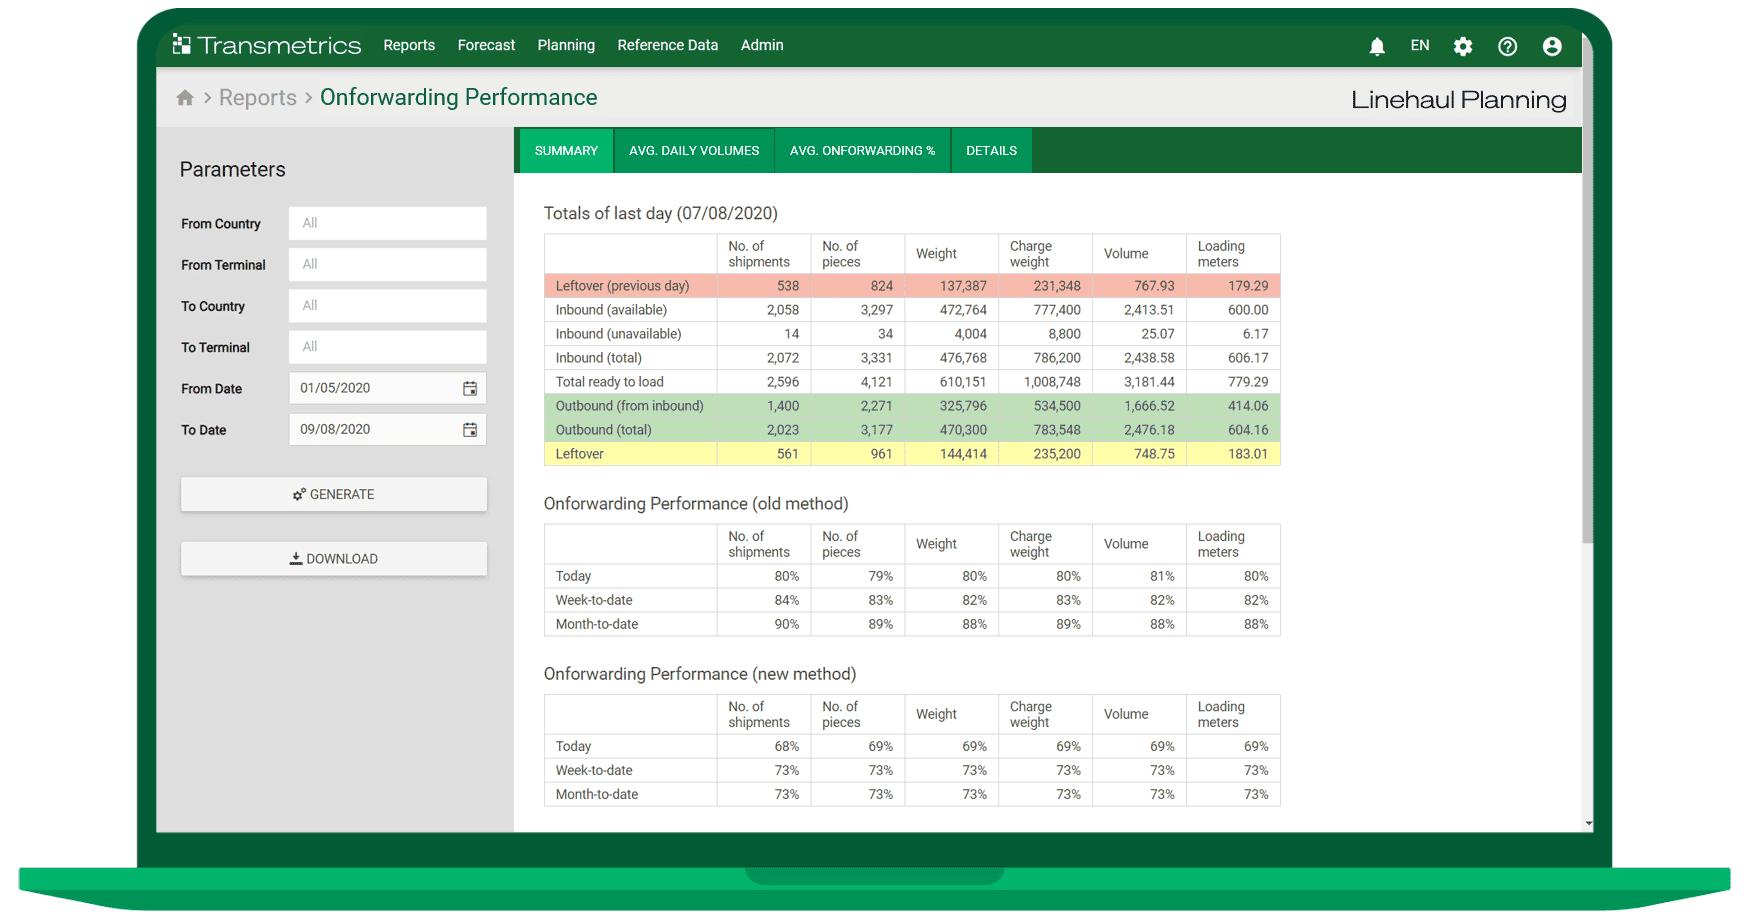 Transmetrics Linehaul Planning Solution: Onforwarding performance report